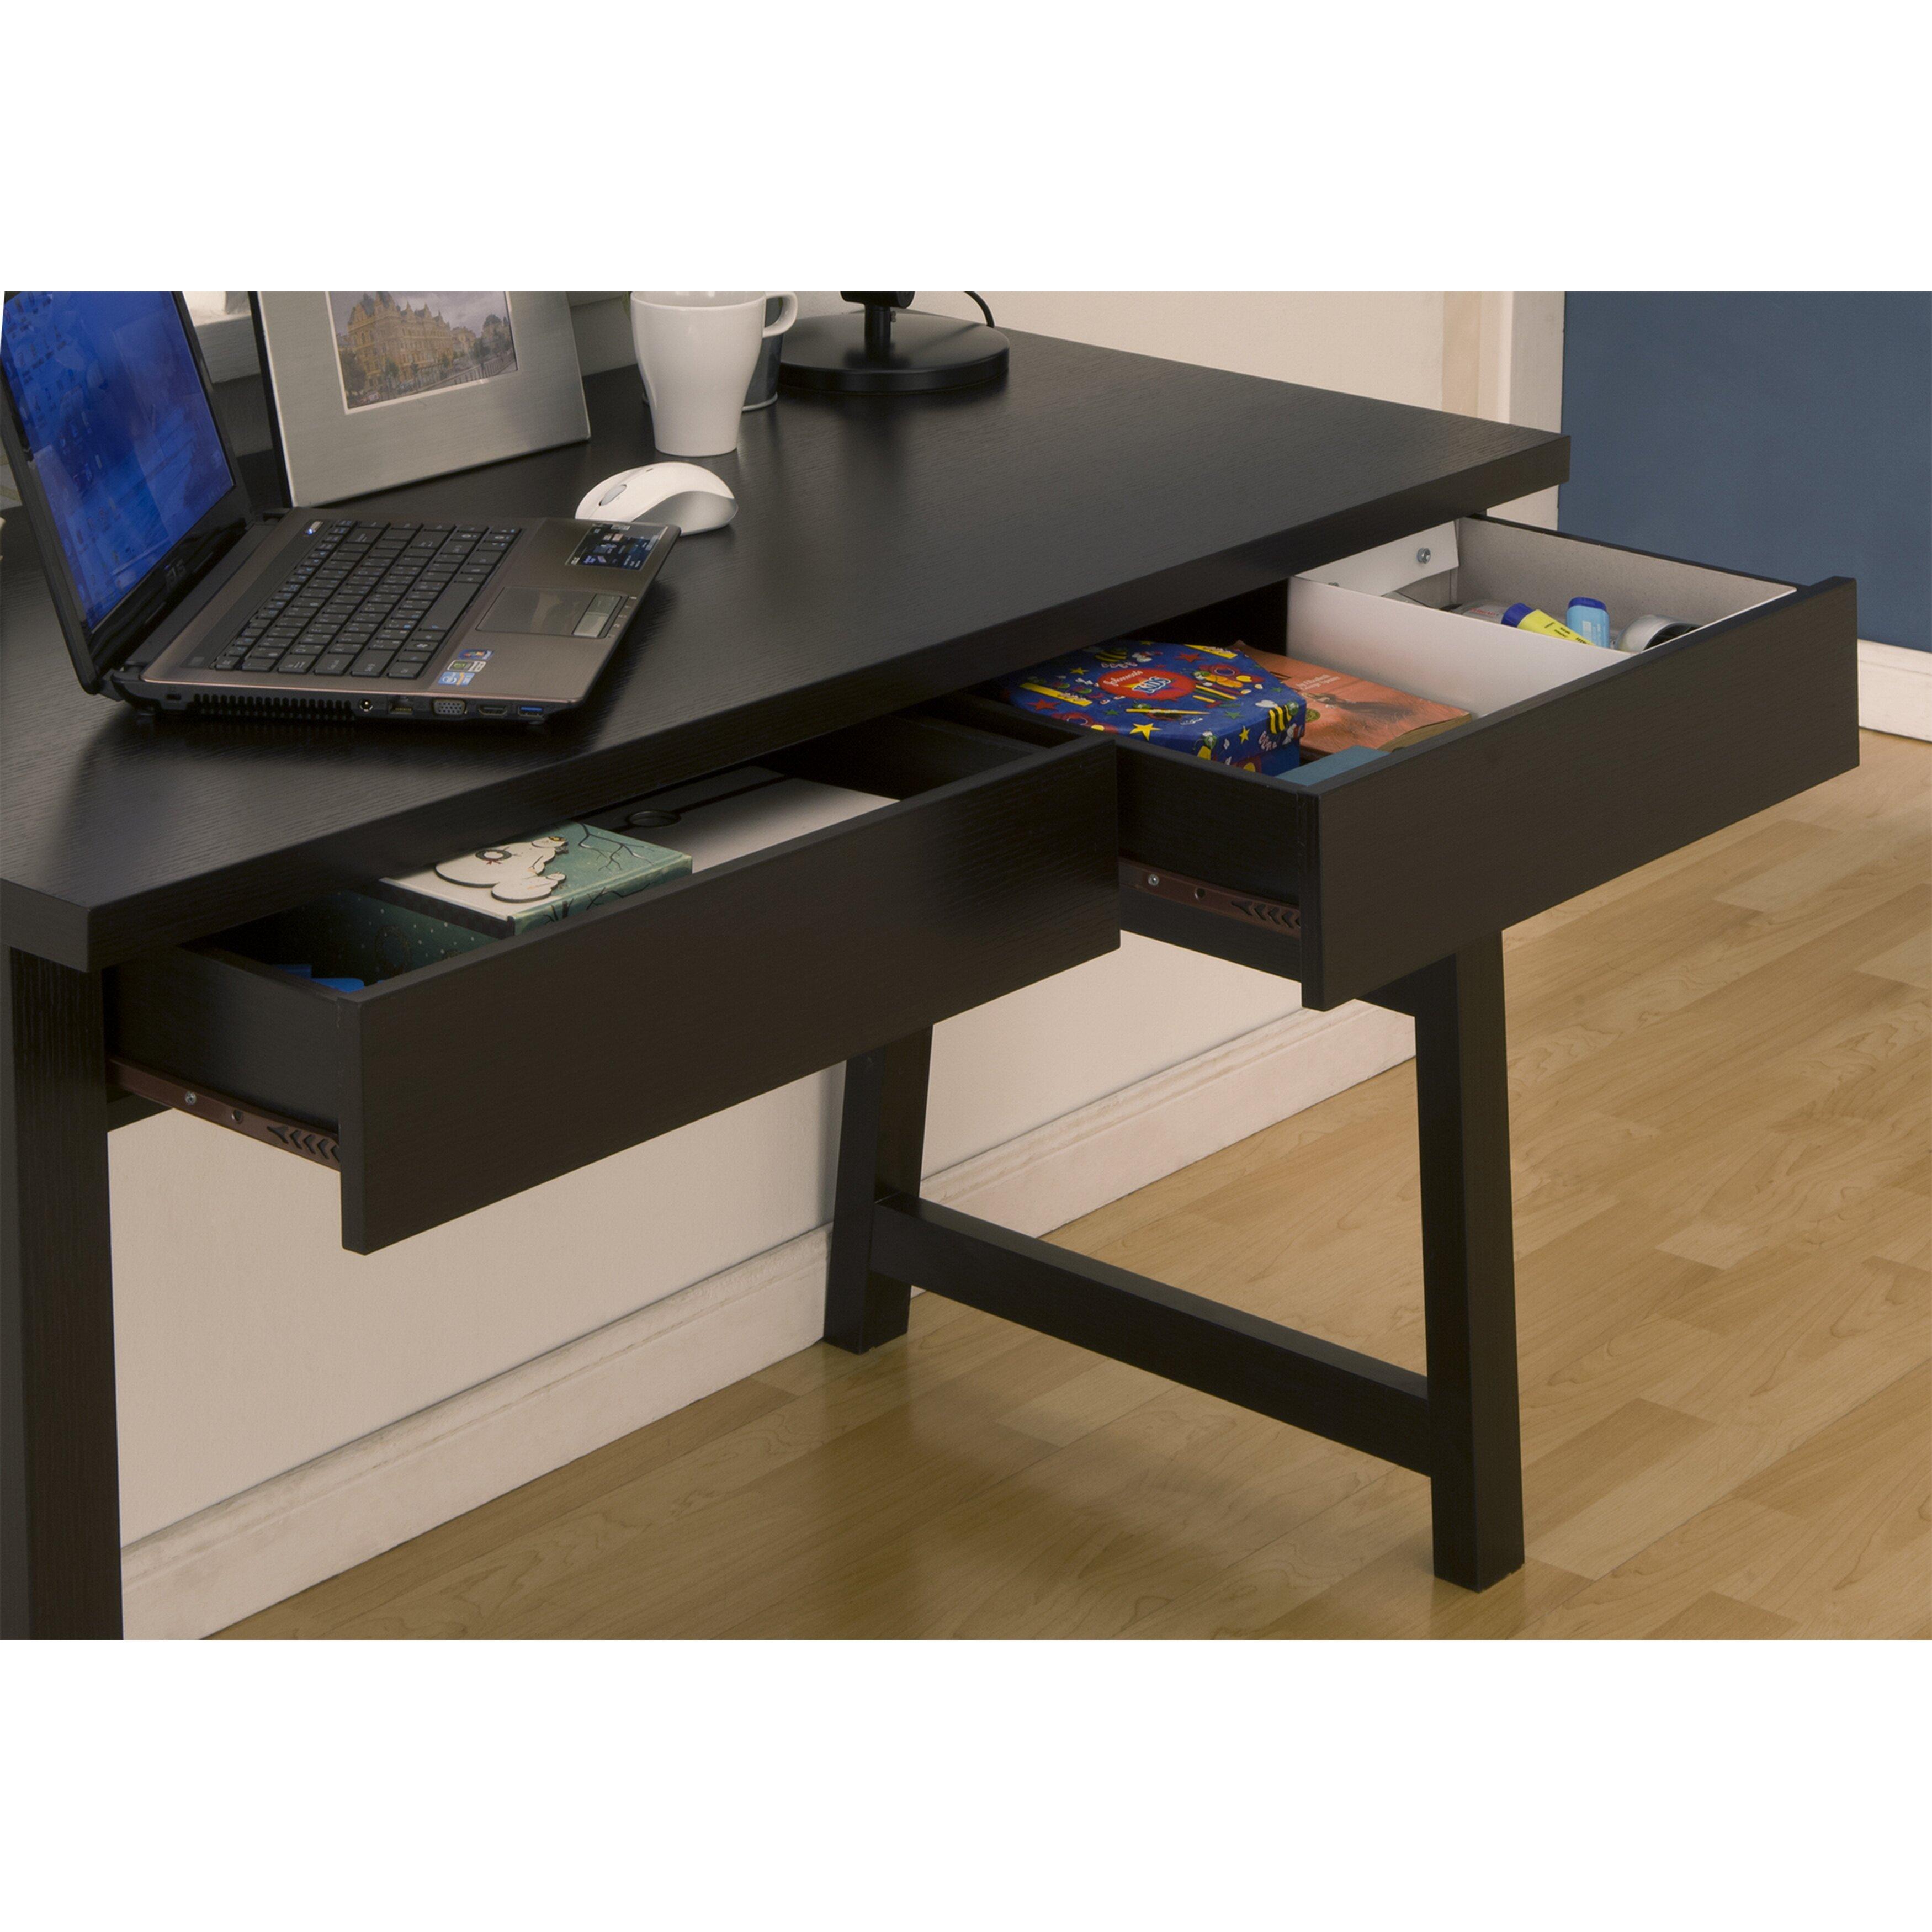 Hokku Designs Hokku Designs Arryl Writing Desk Reviews Wayfair